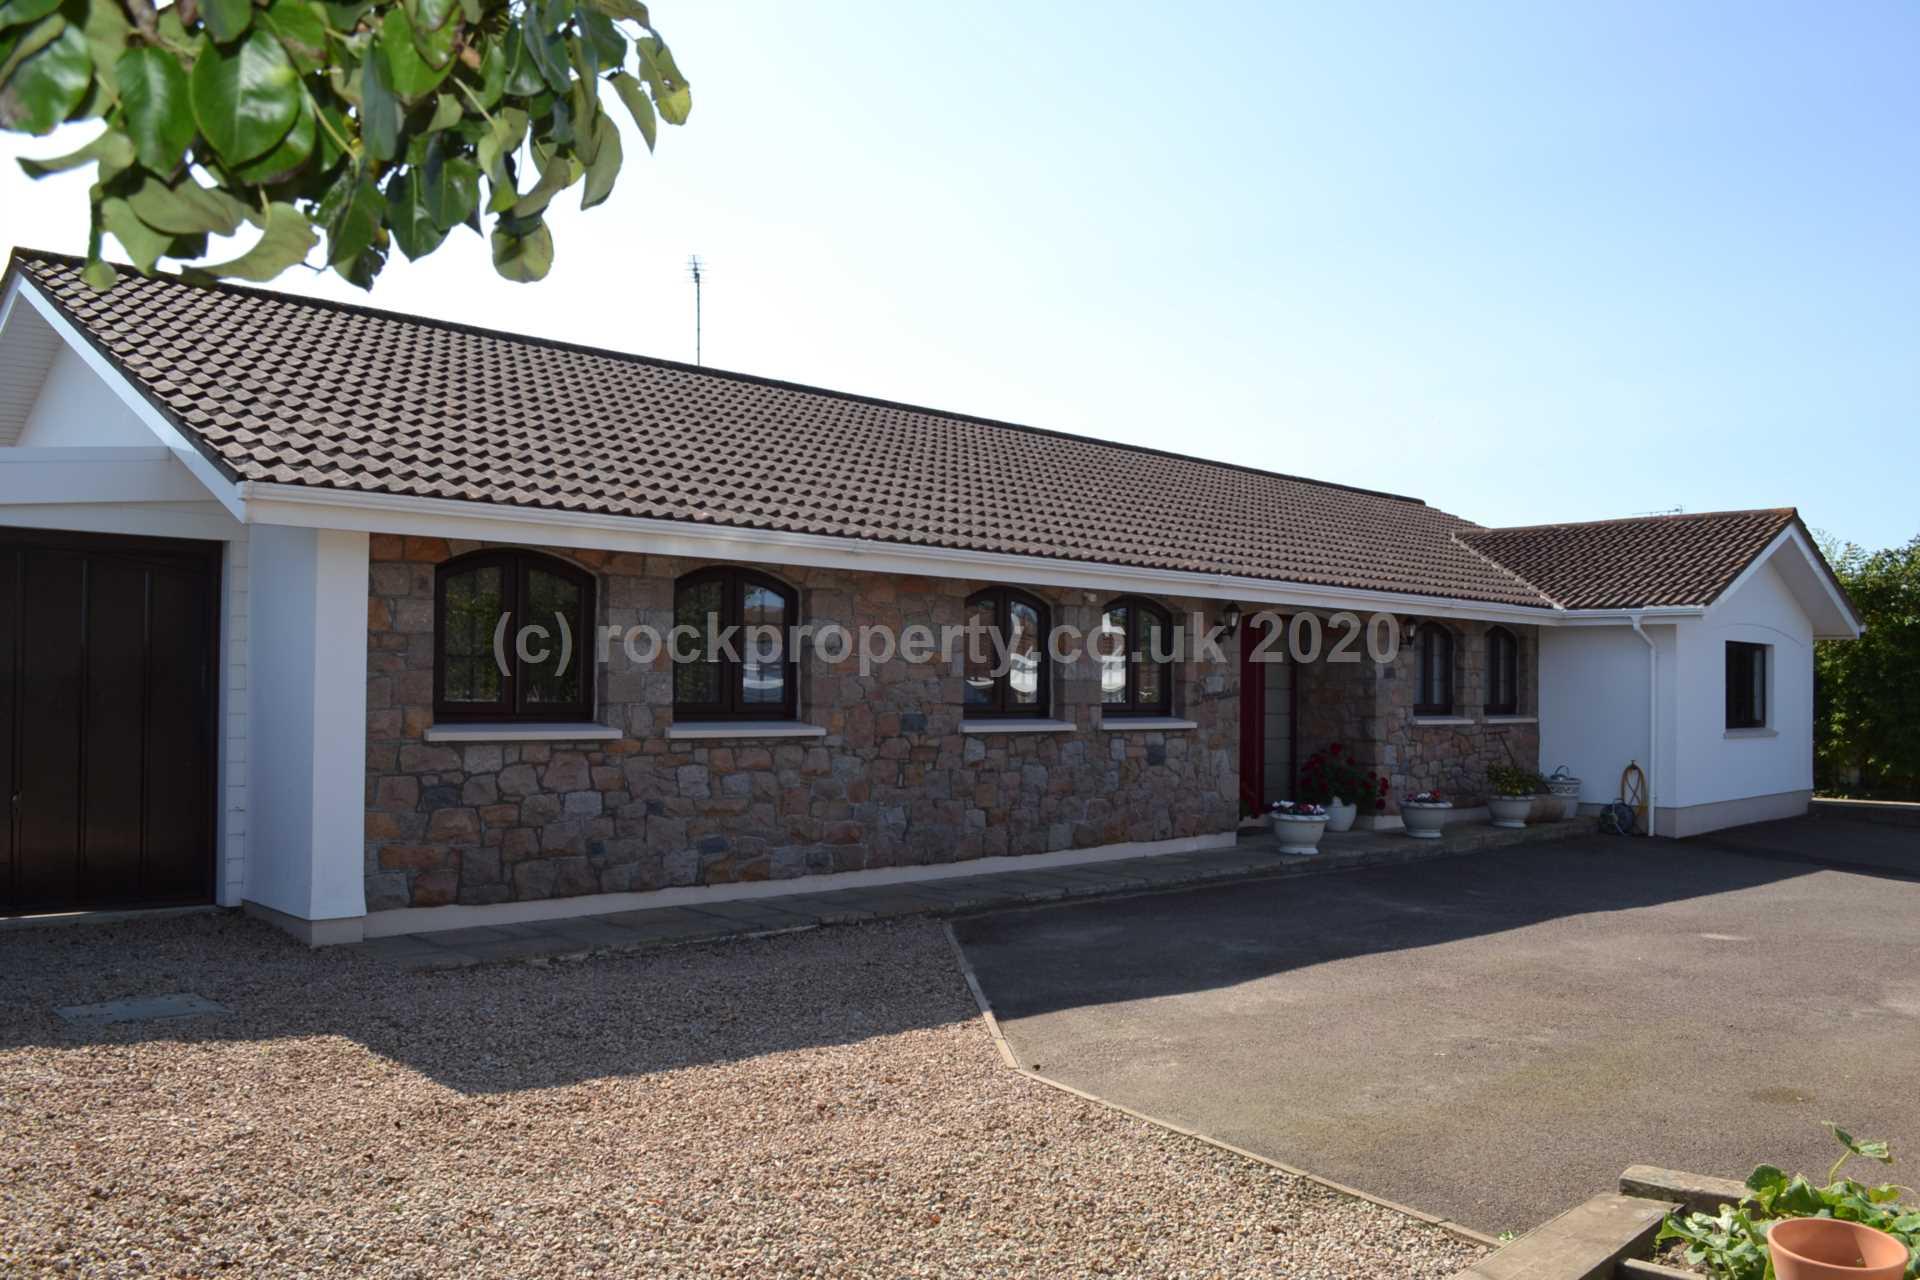 Rockproperty Ltd - 4 Bedroom Bungalow, Clos Des Mont Arthur, St Brelade